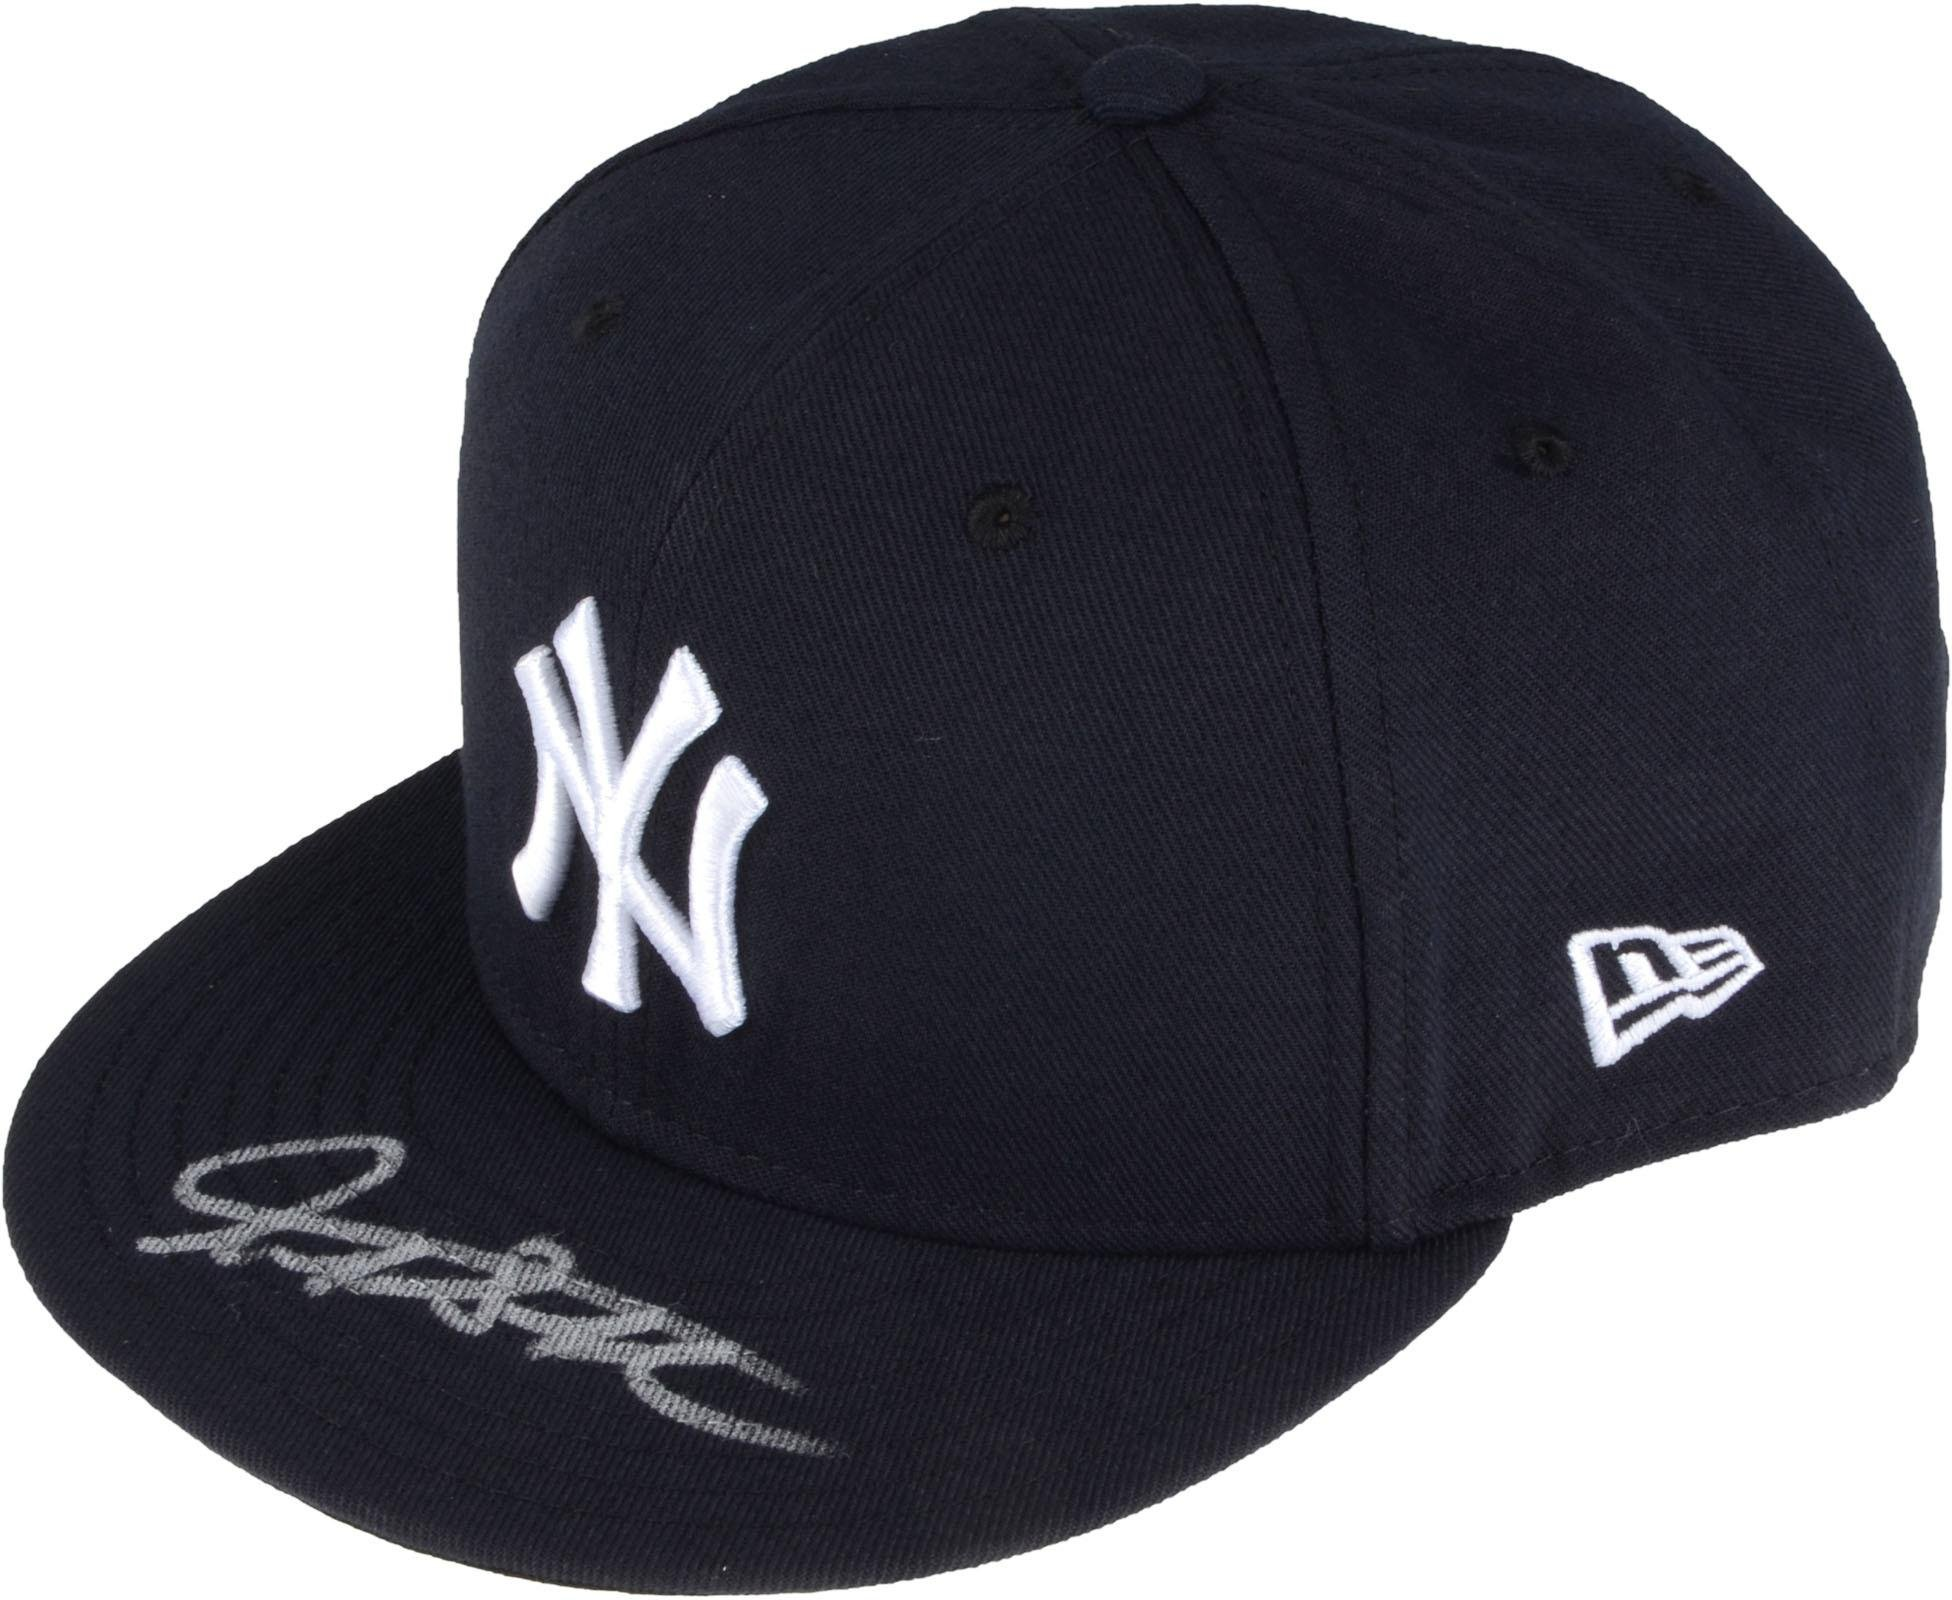 Giancarlo Stanton New York Yankees Autographed Cap Fanatics Authentic Certified Autographed Hats